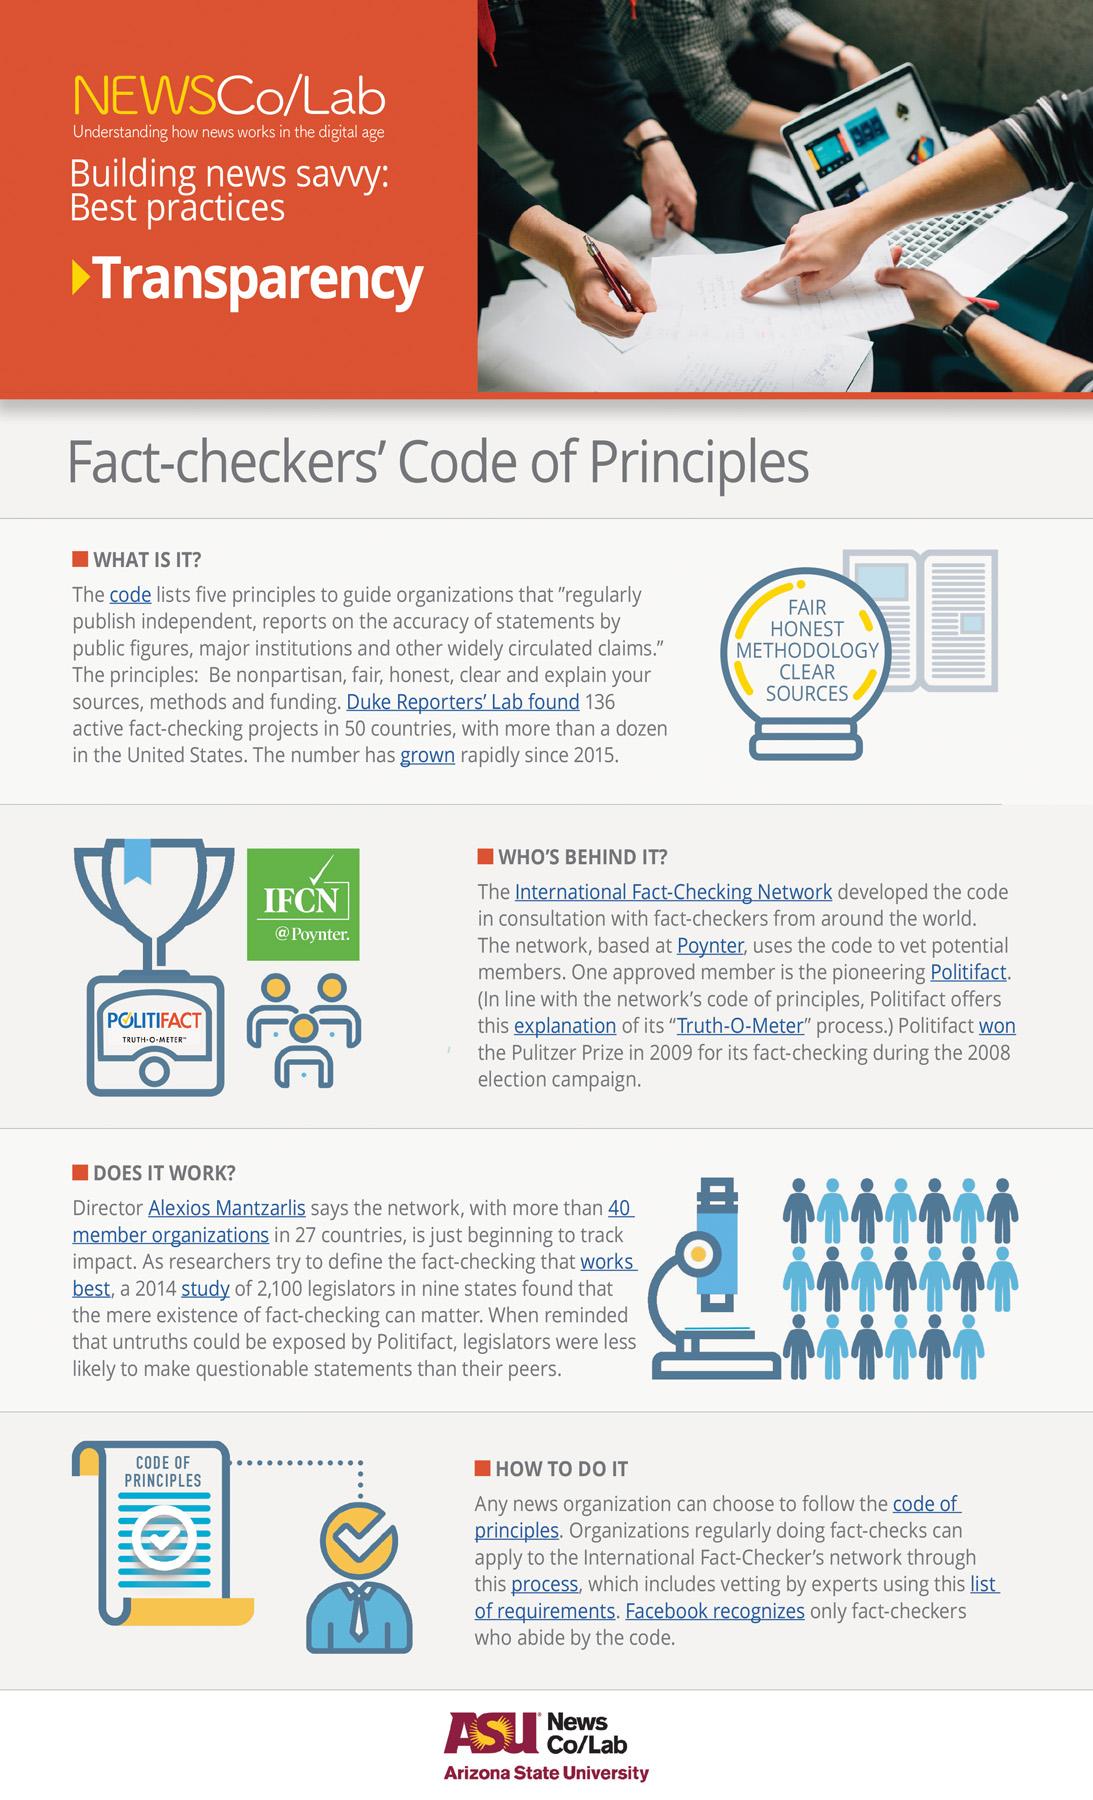 Best Practice: International Fact-Checking Network